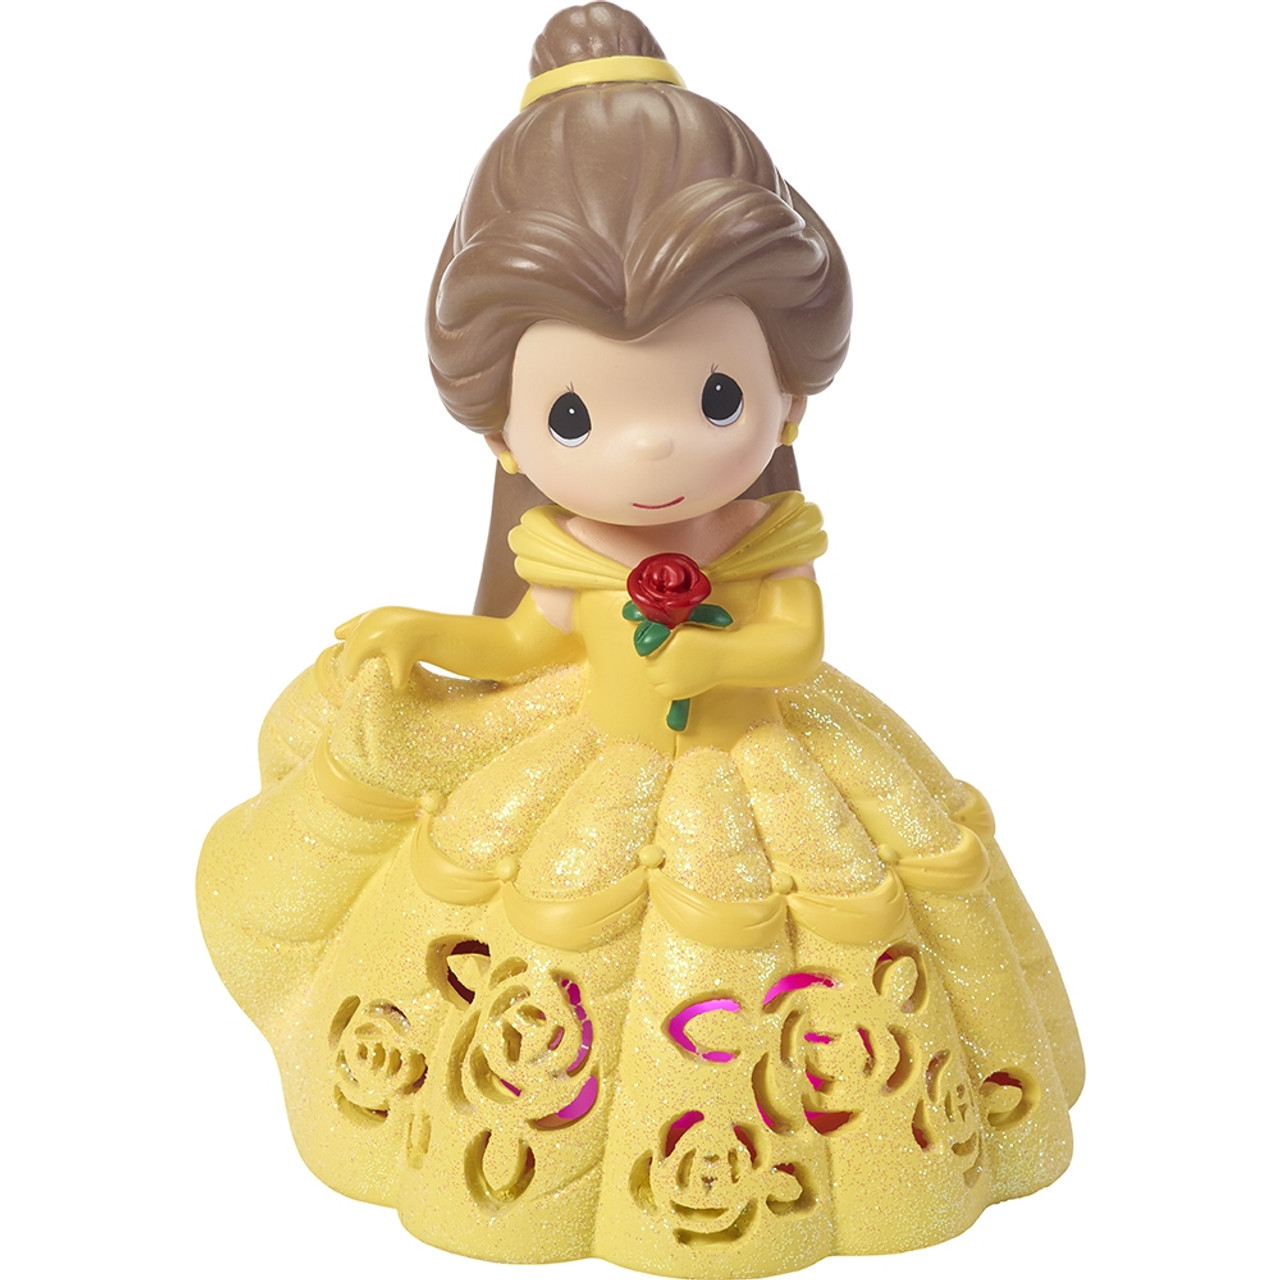 Disney Showcase 4045444 Figurine Princess Belle in a wedding dress